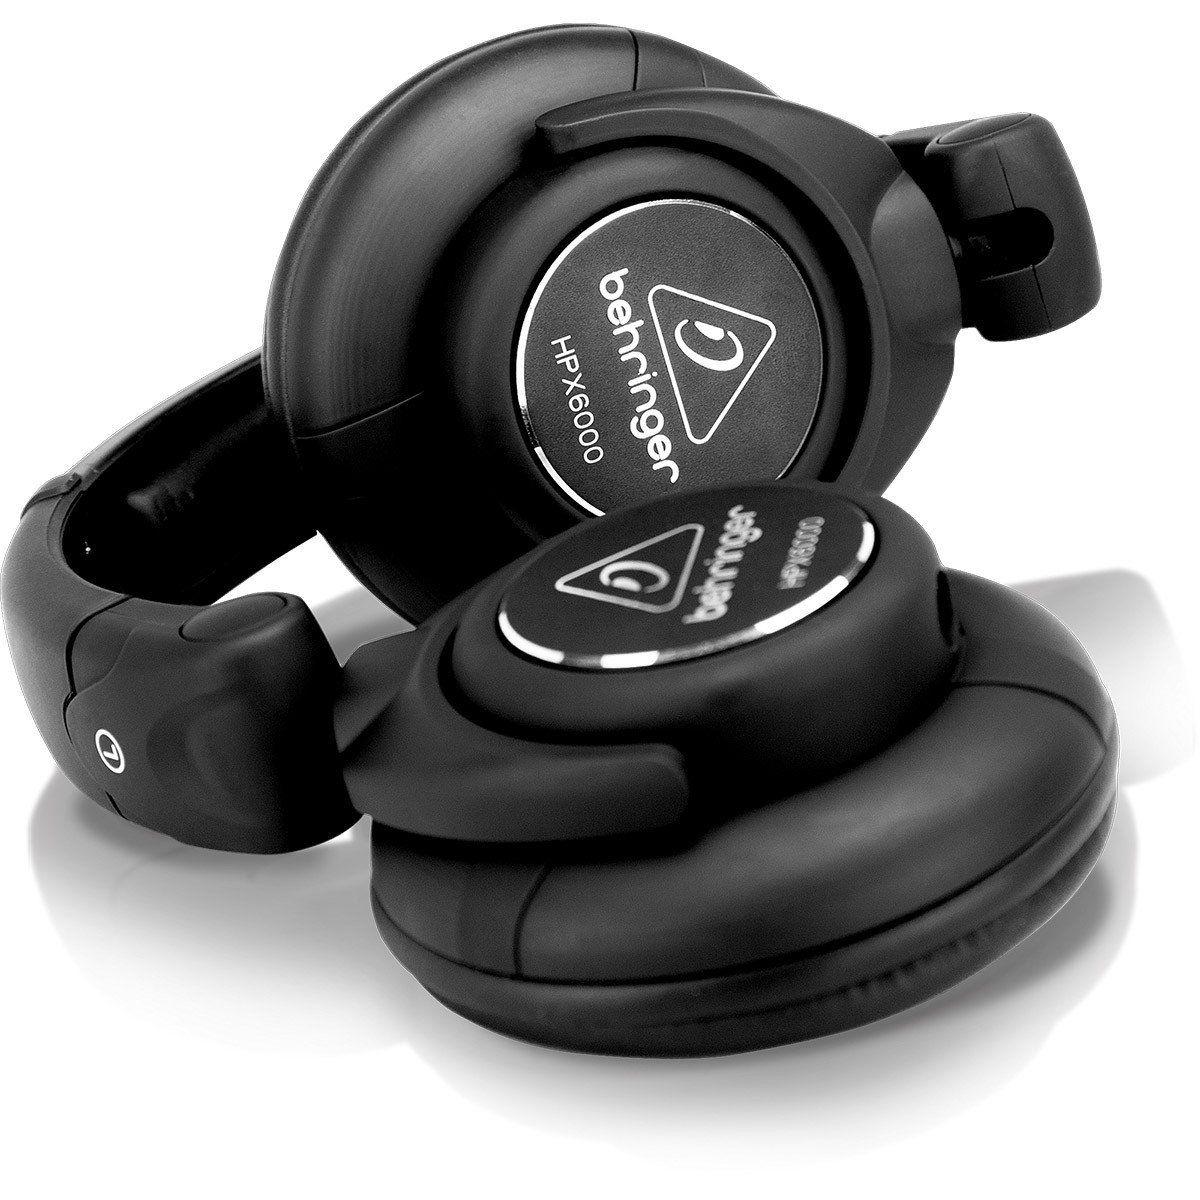 Behringer HPX6000 Fone de Ouvido HPX-6000 Fechado para DJ Profissional